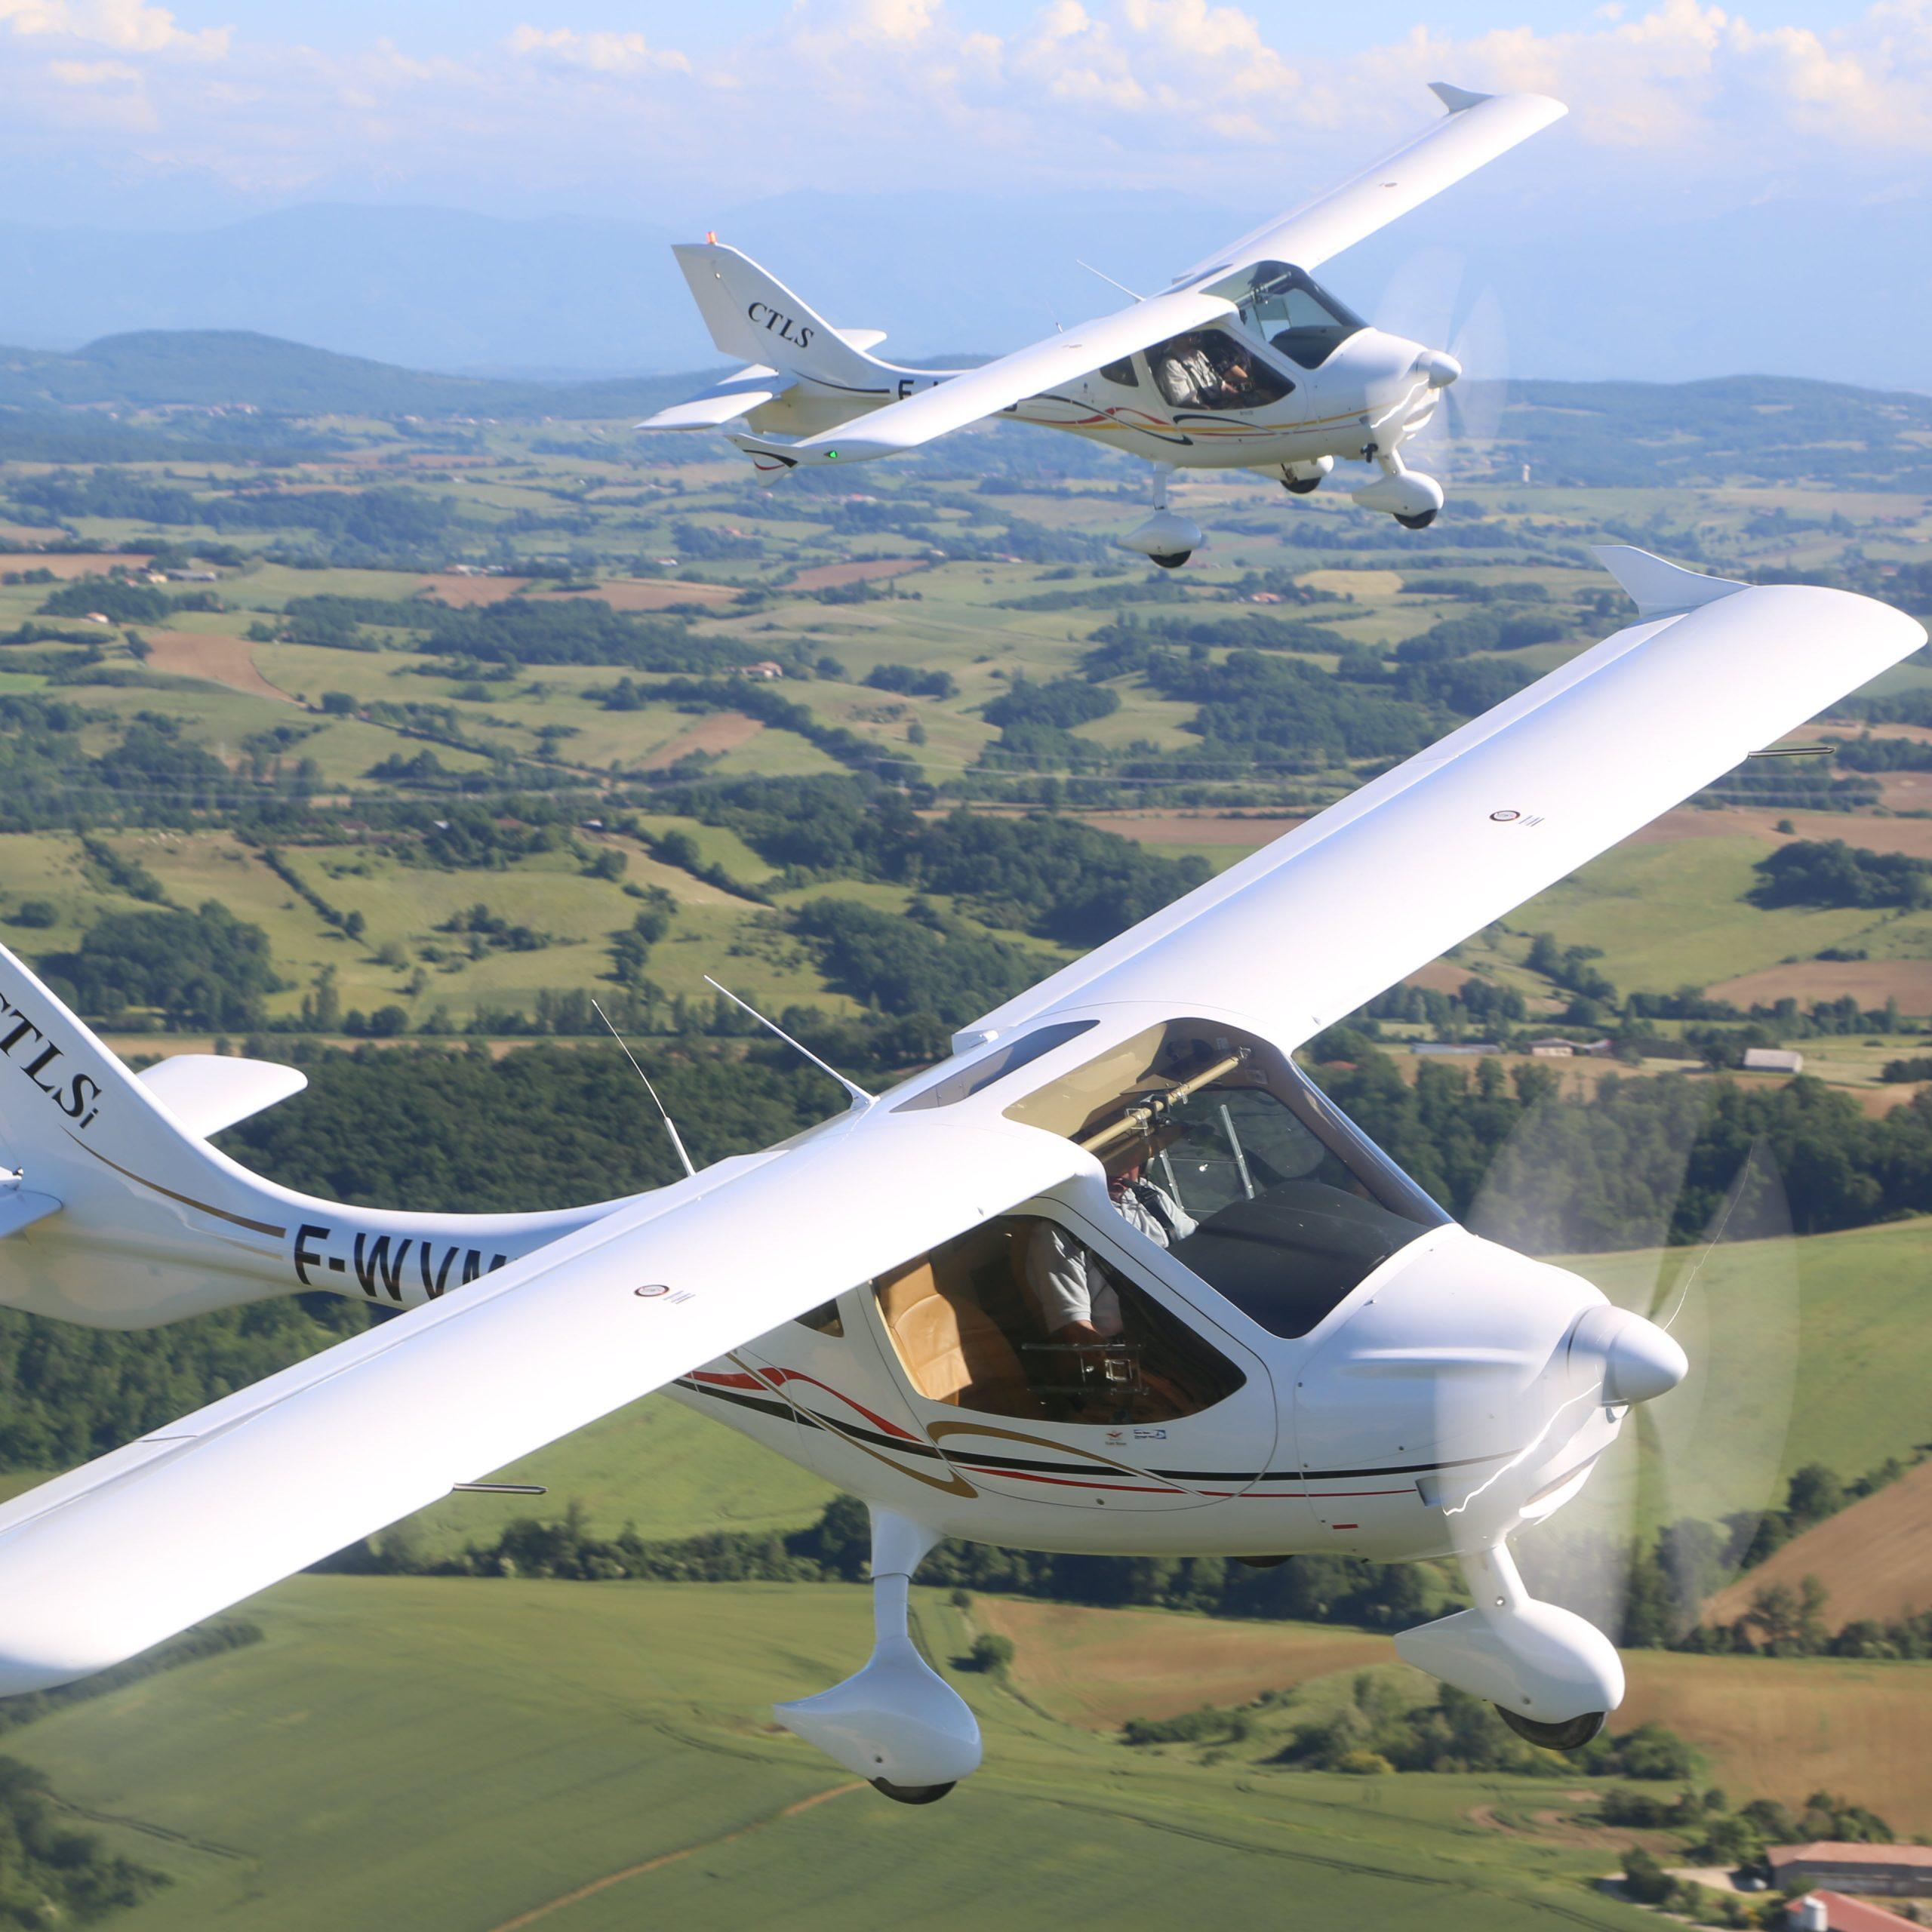 FLIGHT DESIGN CTLS SERIES APPROVED FOR 600KG BY DAeC